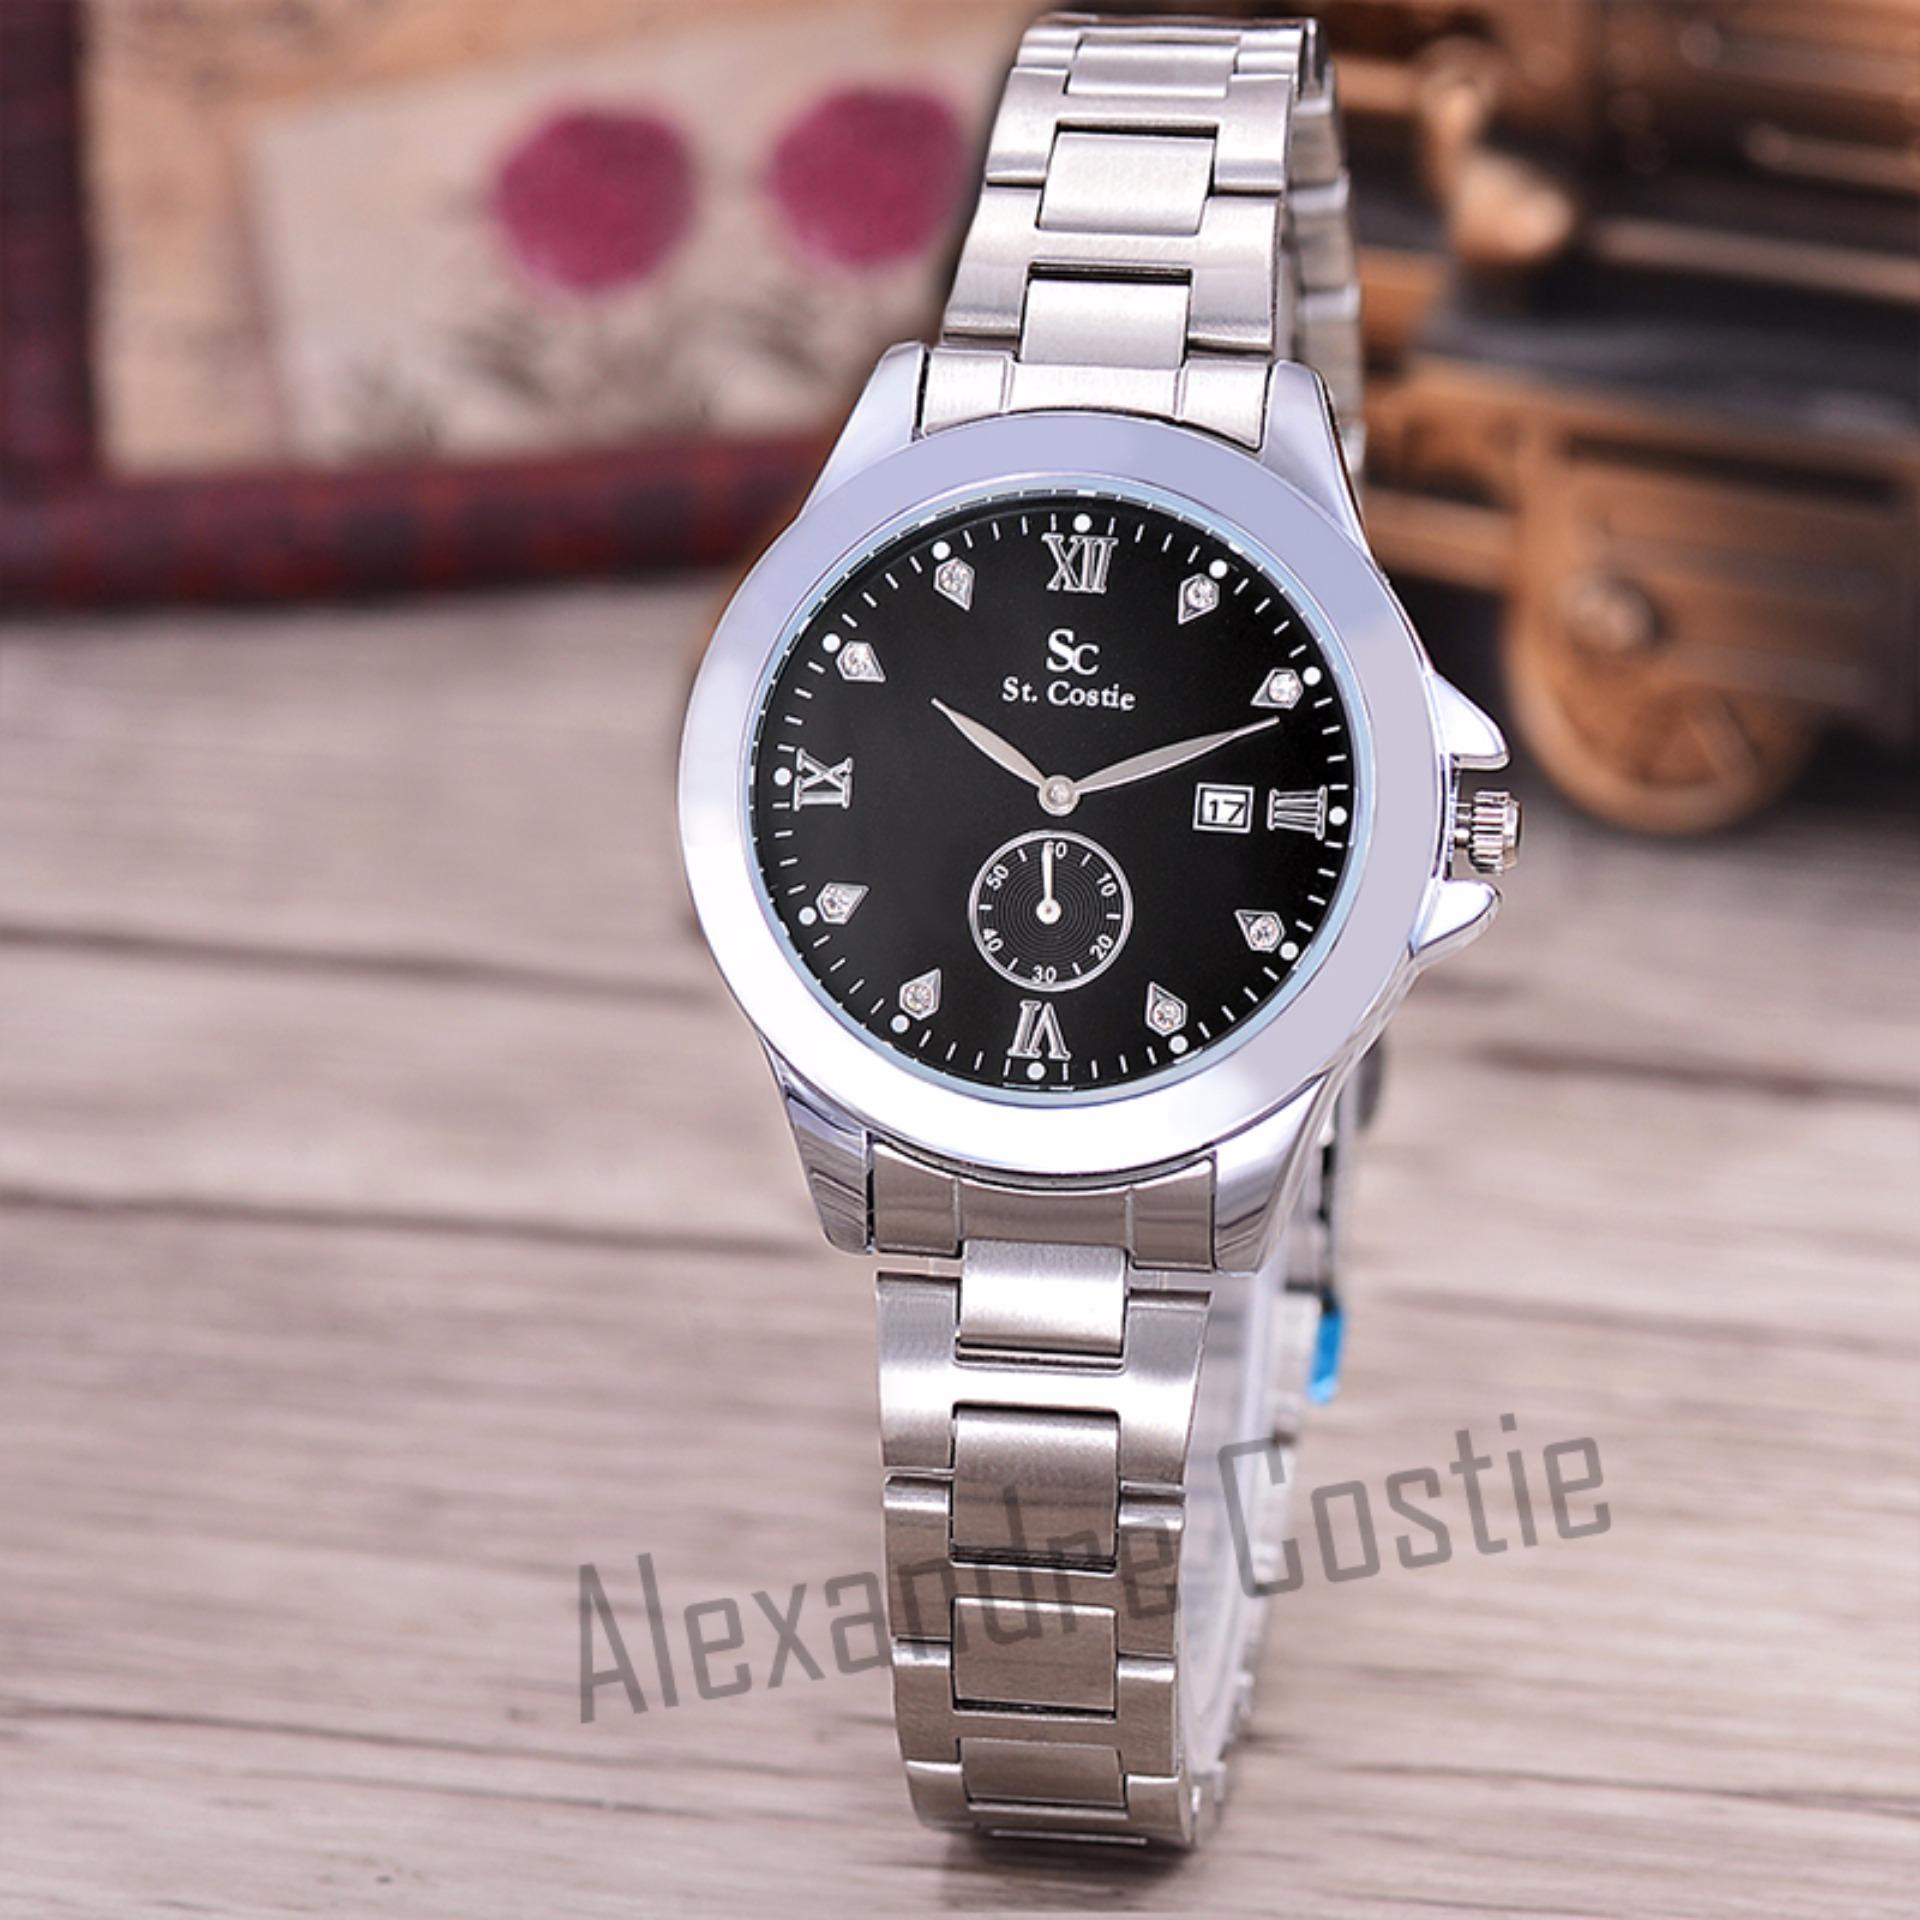 "Hot Deals ""Saint Costie Original Brand, Jam Tangan Wanita - Body Silver - Black"